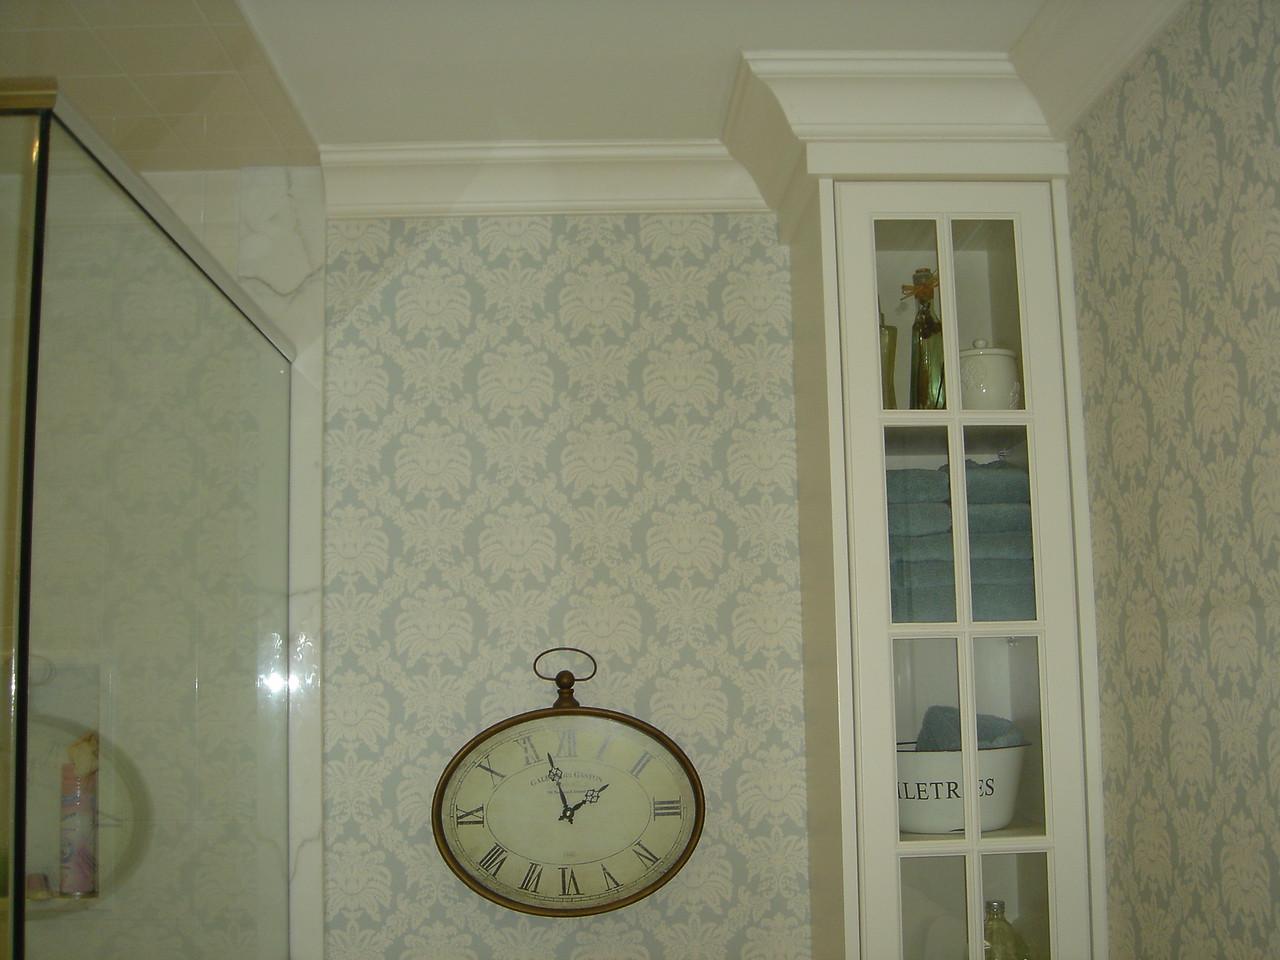 Upper part of corner